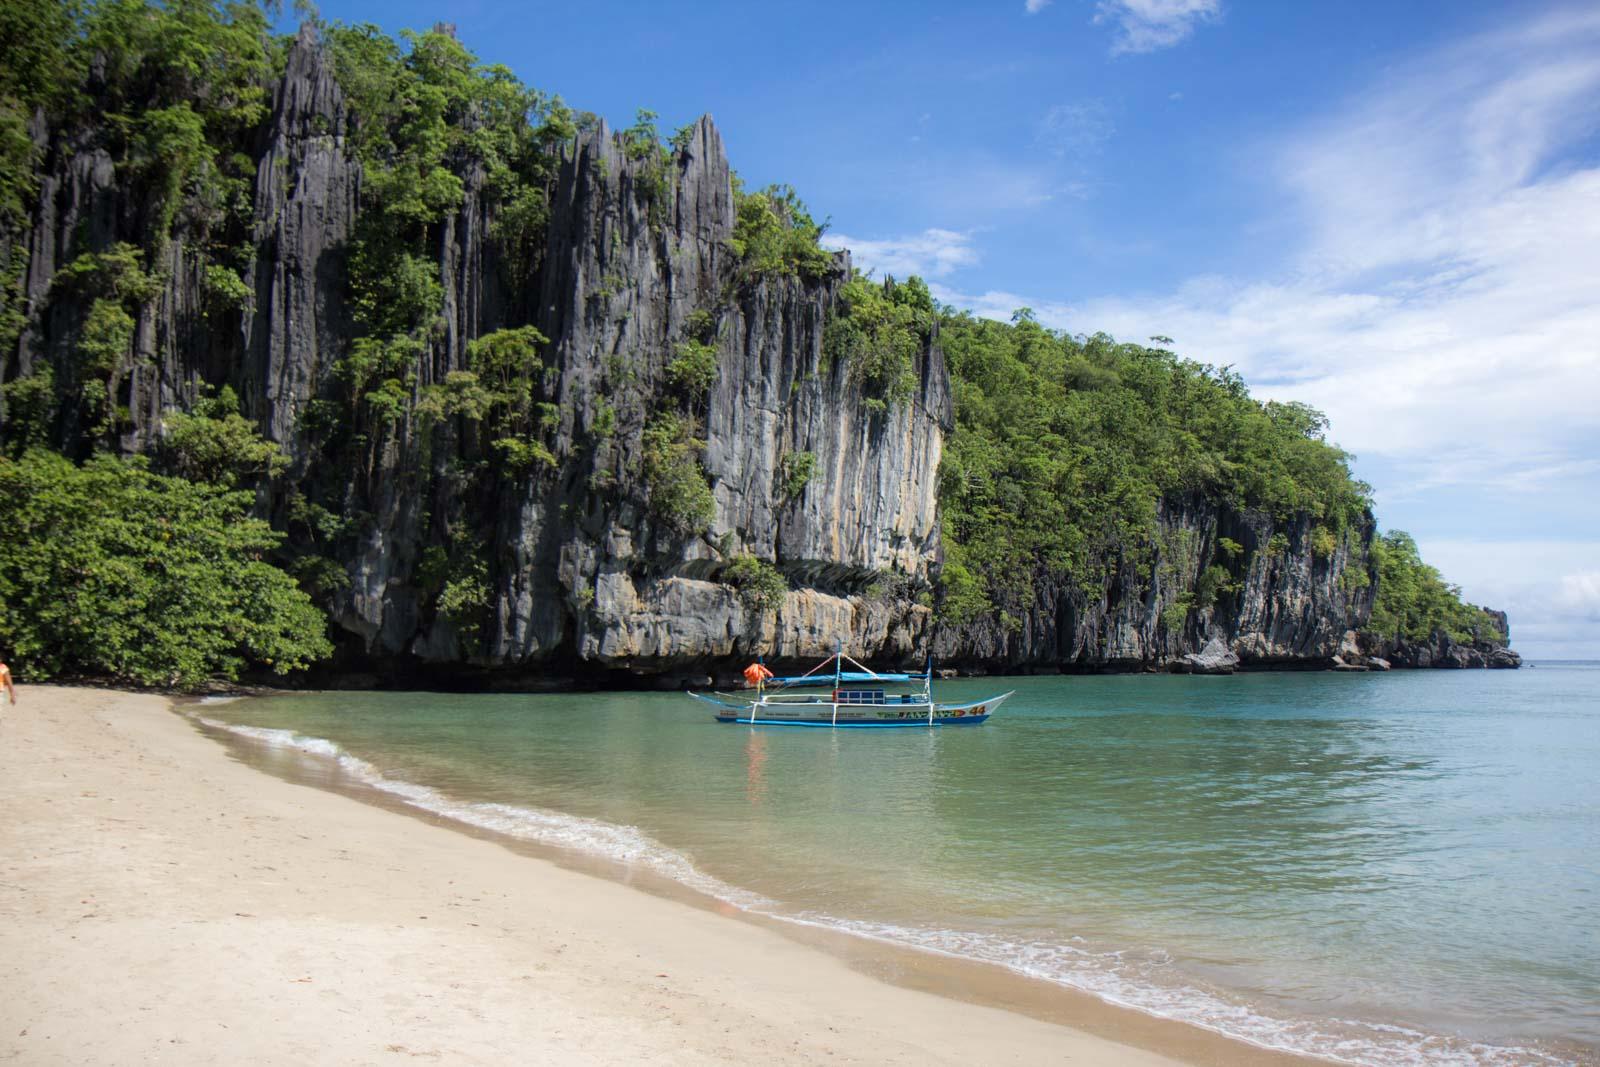 Puerto-Princesa Subterranean River National Park, Palawan, Philippines